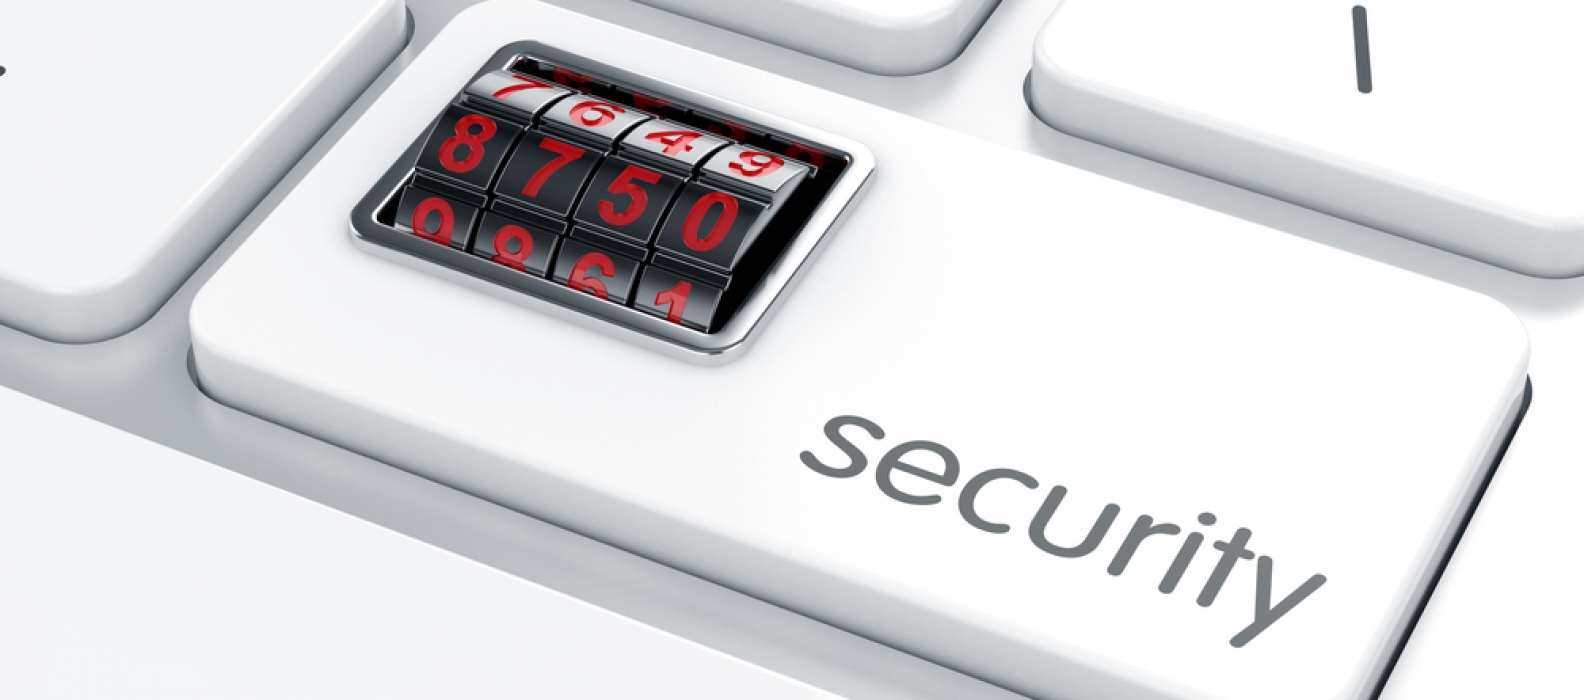 Enable AWS MFA Using Google Authenticator